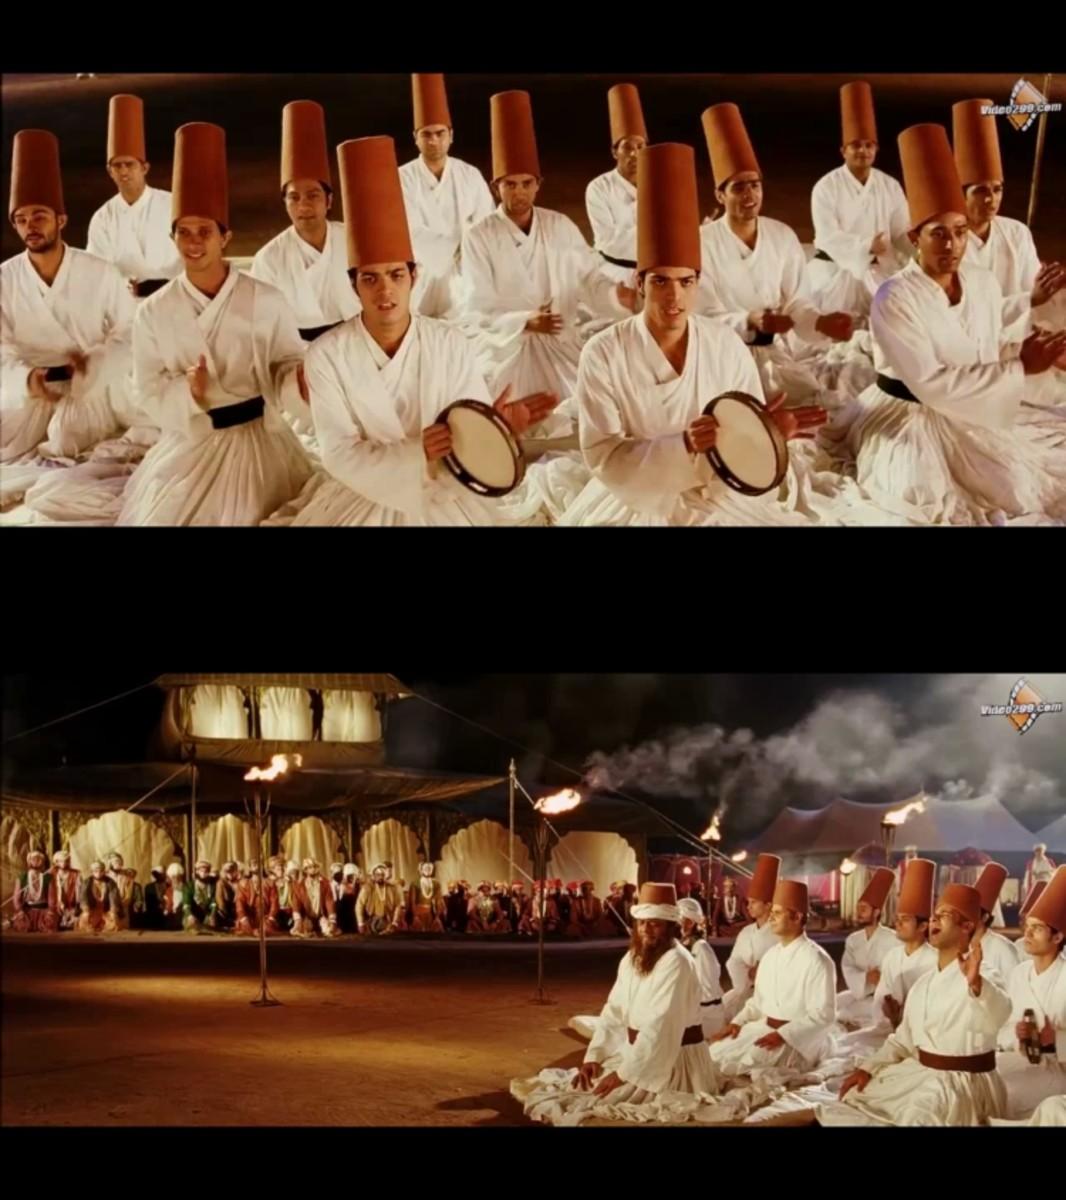 Aishwayra Rai & Hrithik Roshan in Khwaja mere kwaja ... : An exceptionally picturesque qawwali in full royal splendour.